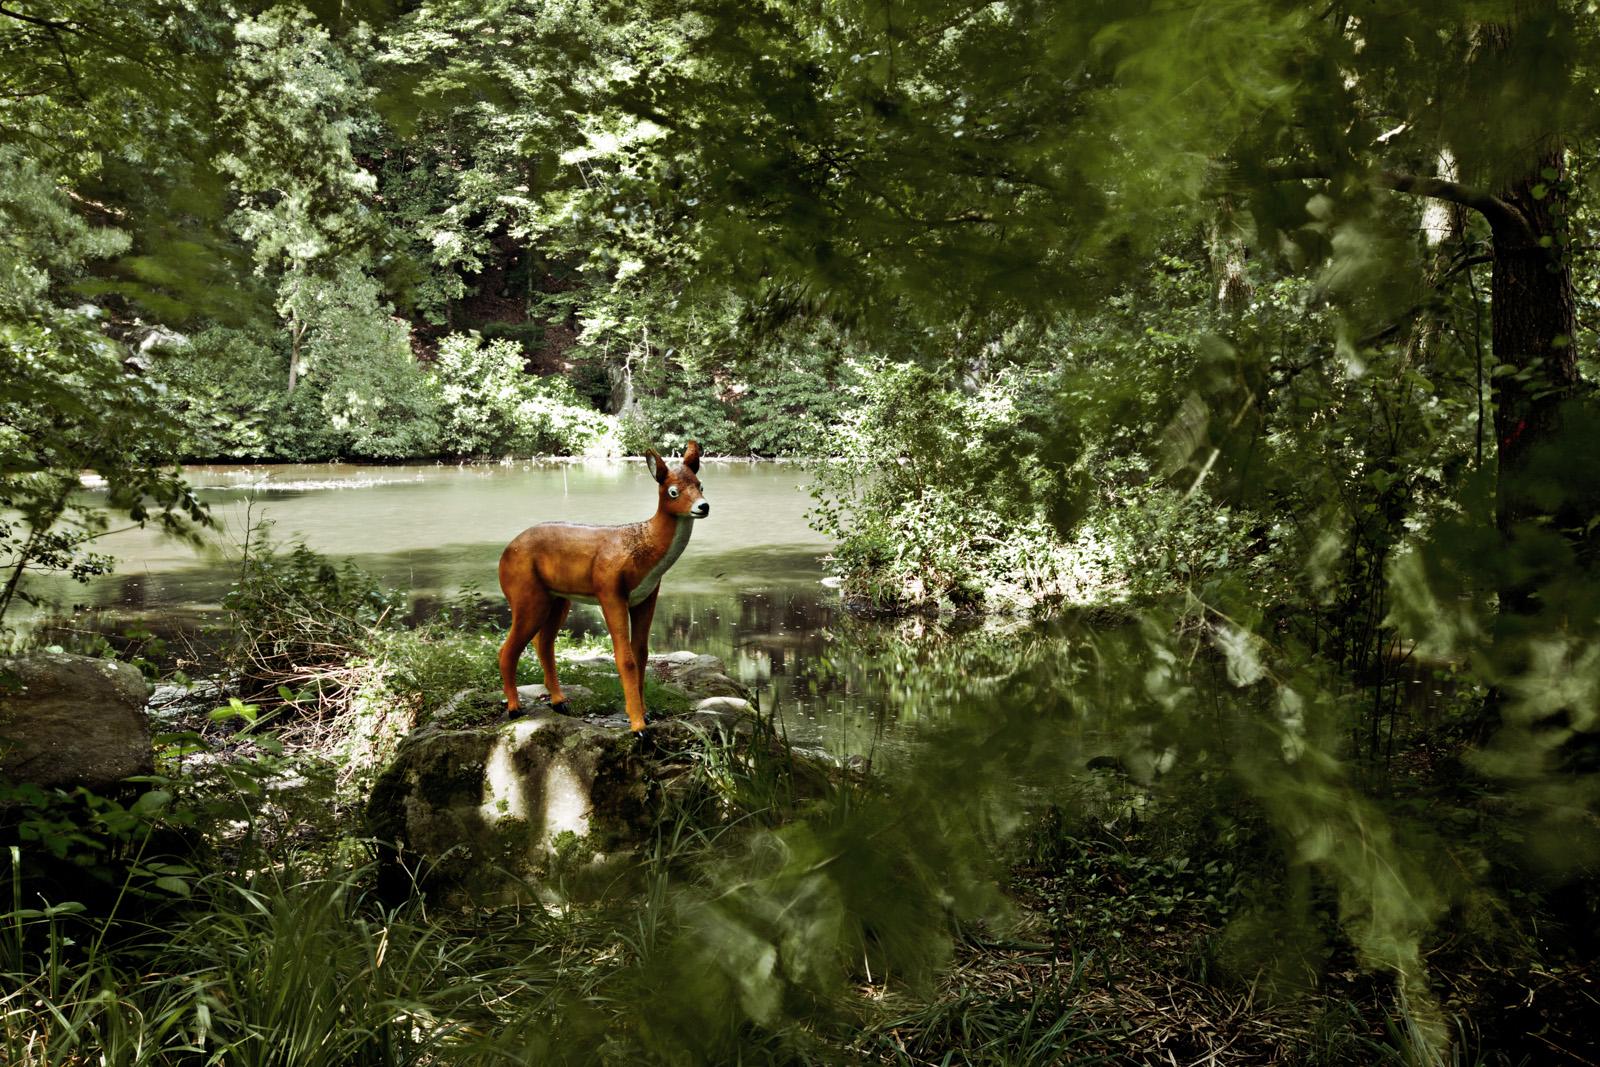 Doris in the wood